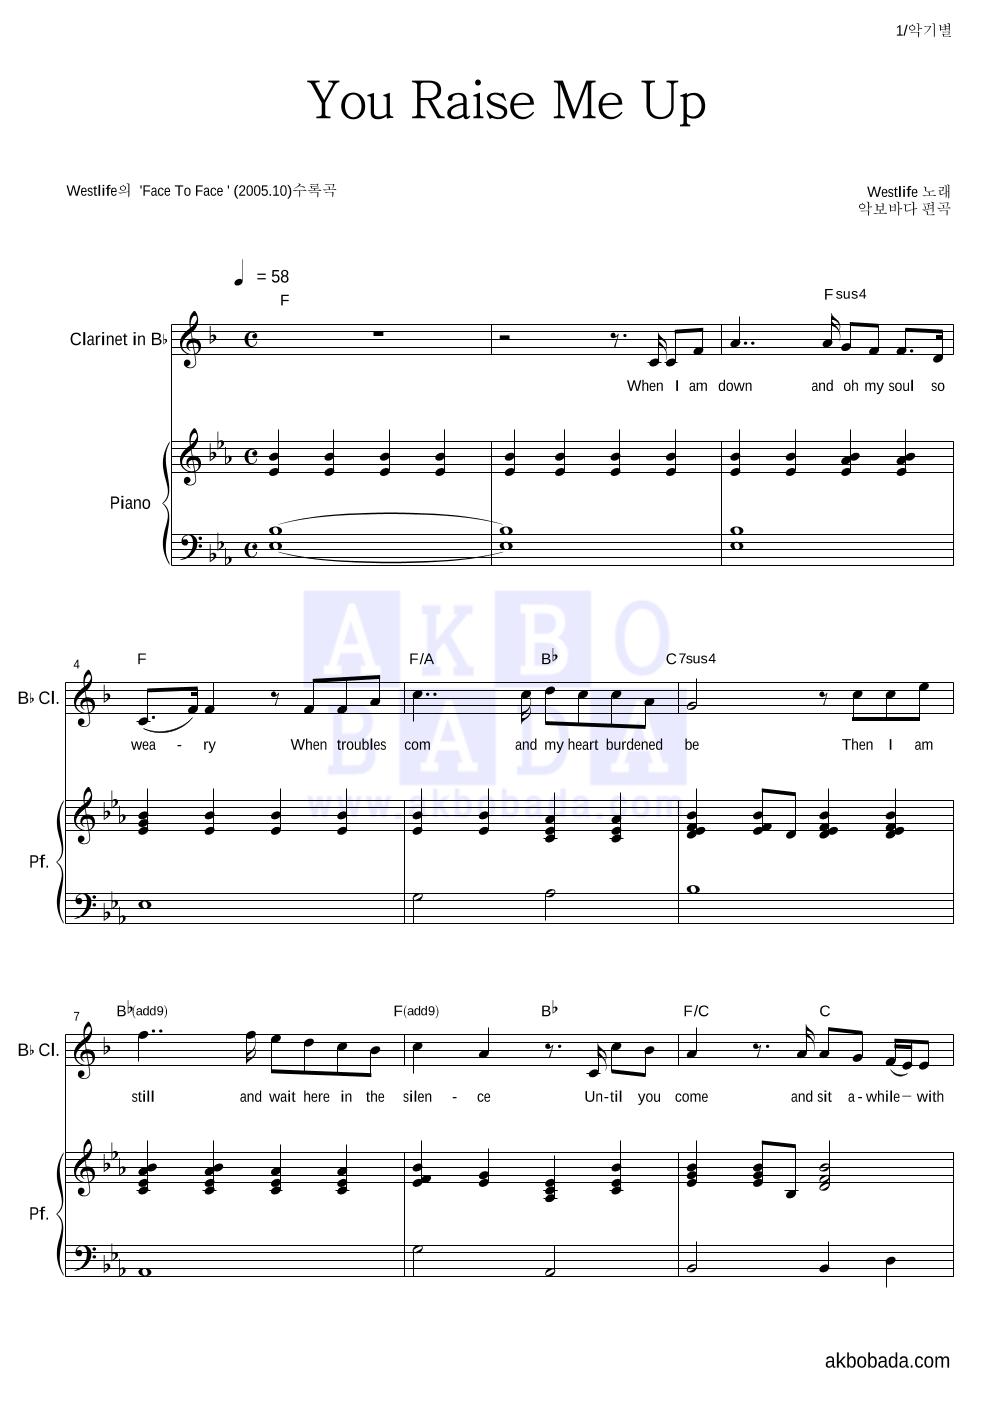 Westlife - You Raise Me Up 클라리넷&피아노 악보